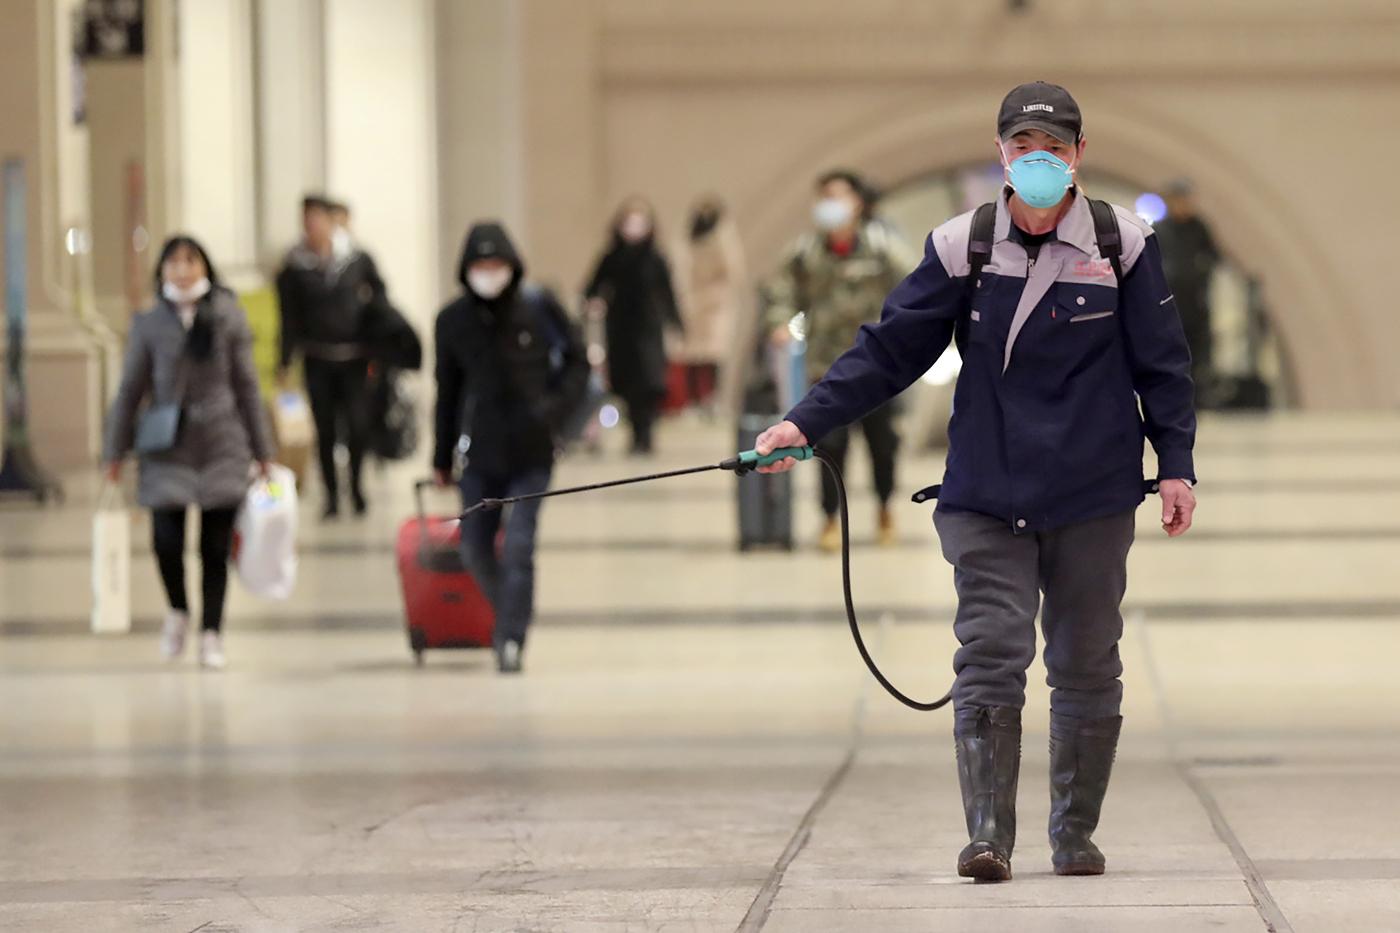 Coronavirus, 41 vittime: primi tre casi accertati in Europa